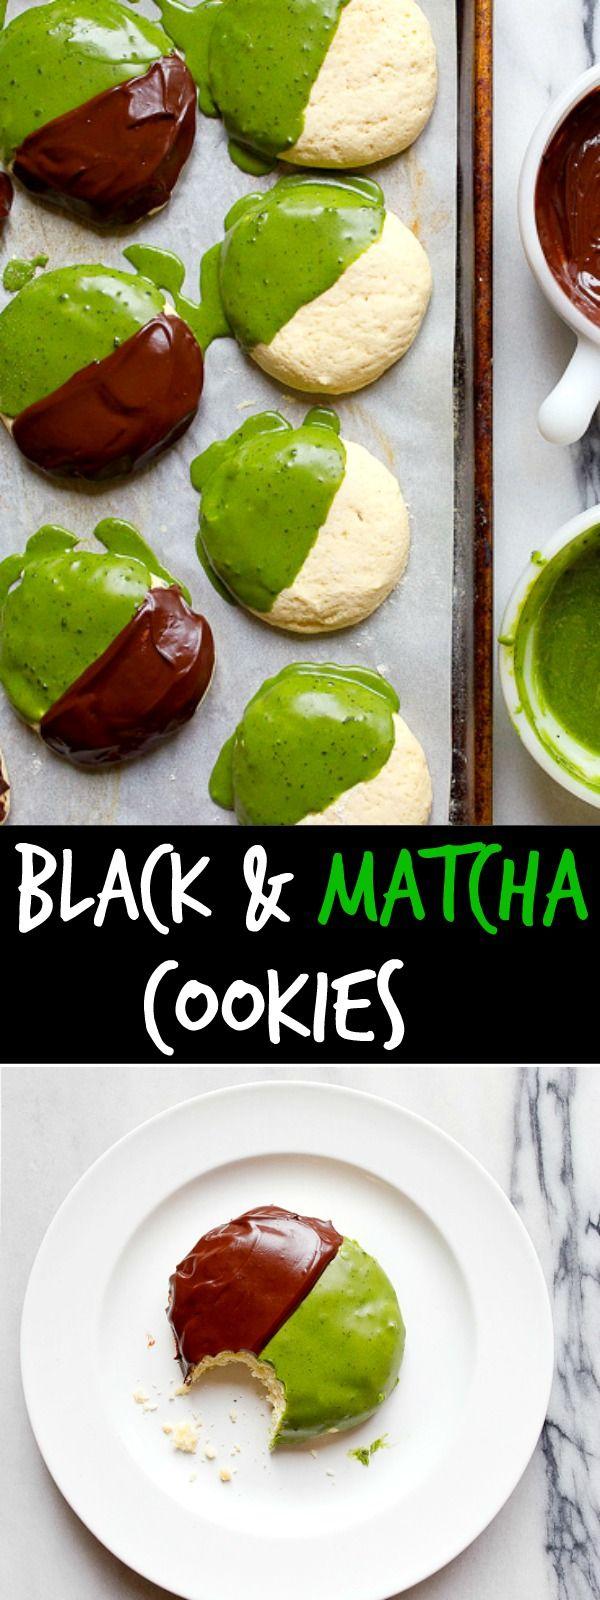 Black and white cookies made with matcha. Matcha tea cookies. Chocolate matcha dessert.